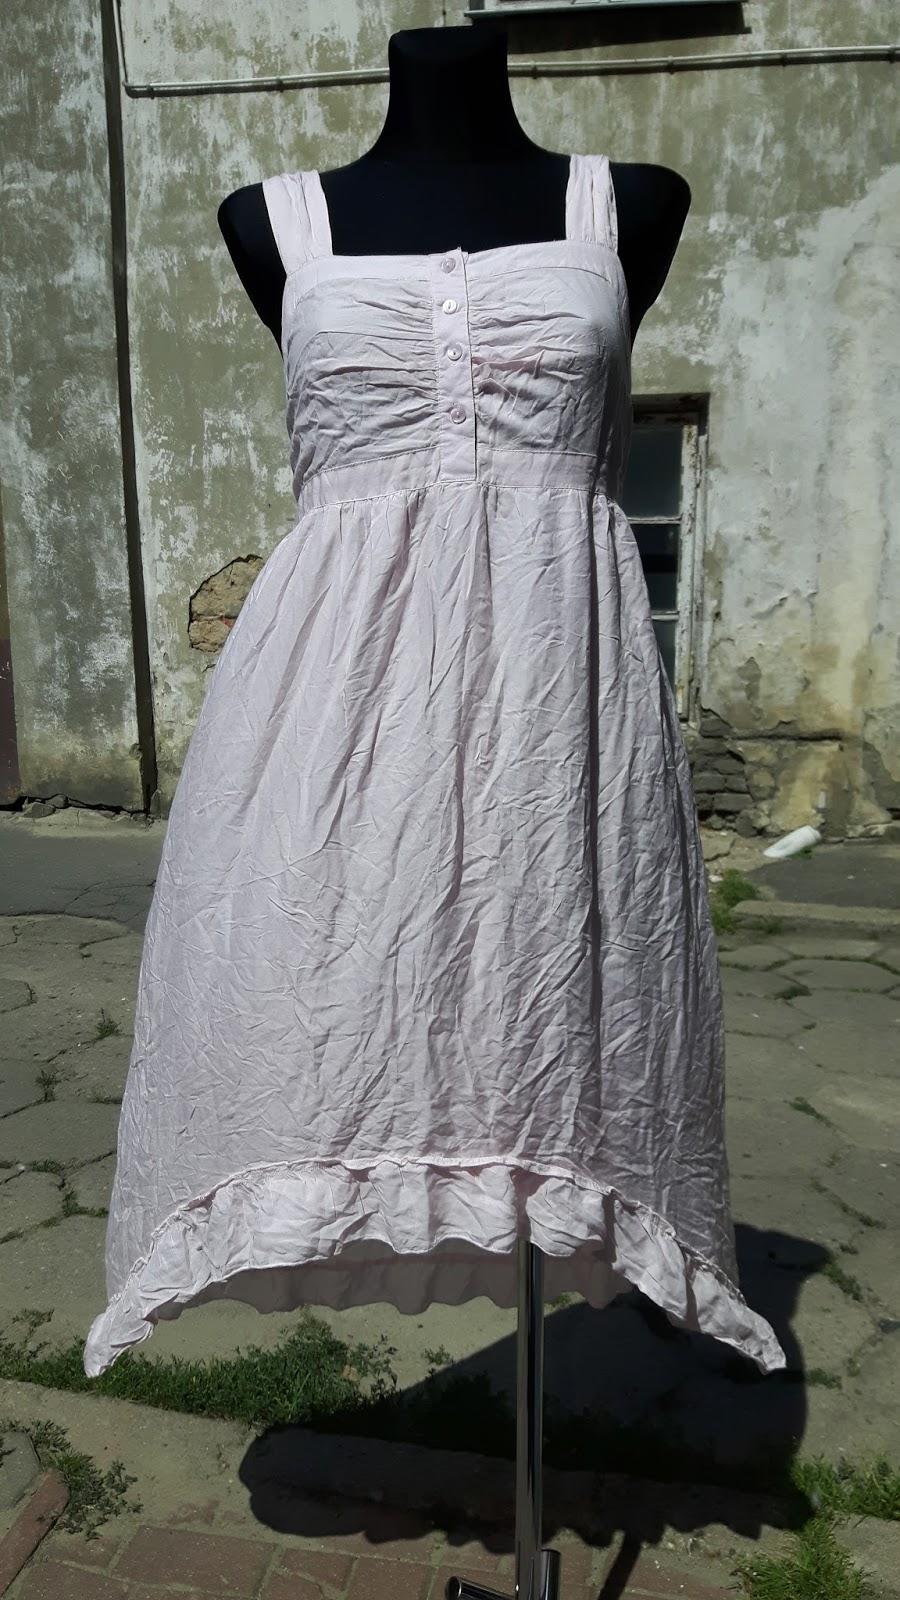 94bbf705f27 Vintage Boutique: Sukienki mini maxi len bawełna tiul kobiece ...